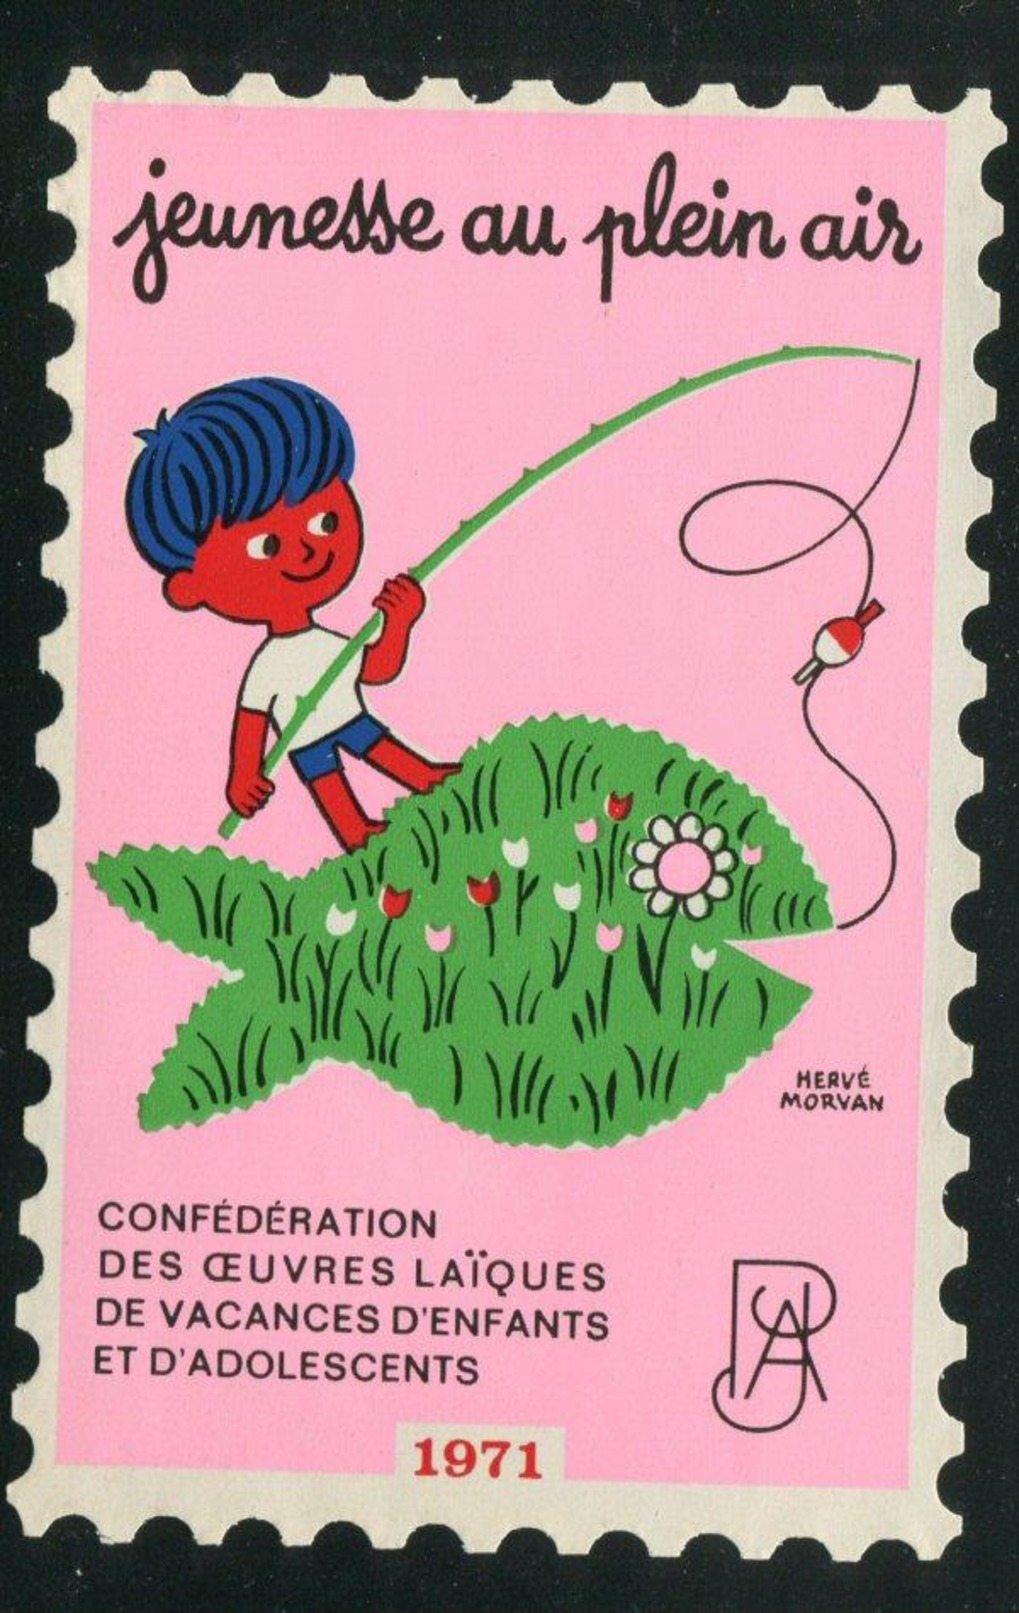 France Grande Vignette Antituberculeux 1971 Jeunesse Au Plein Air Windshield Label Greens 195.w2  3 3/4 X 5 1/2 - Antituberculeux